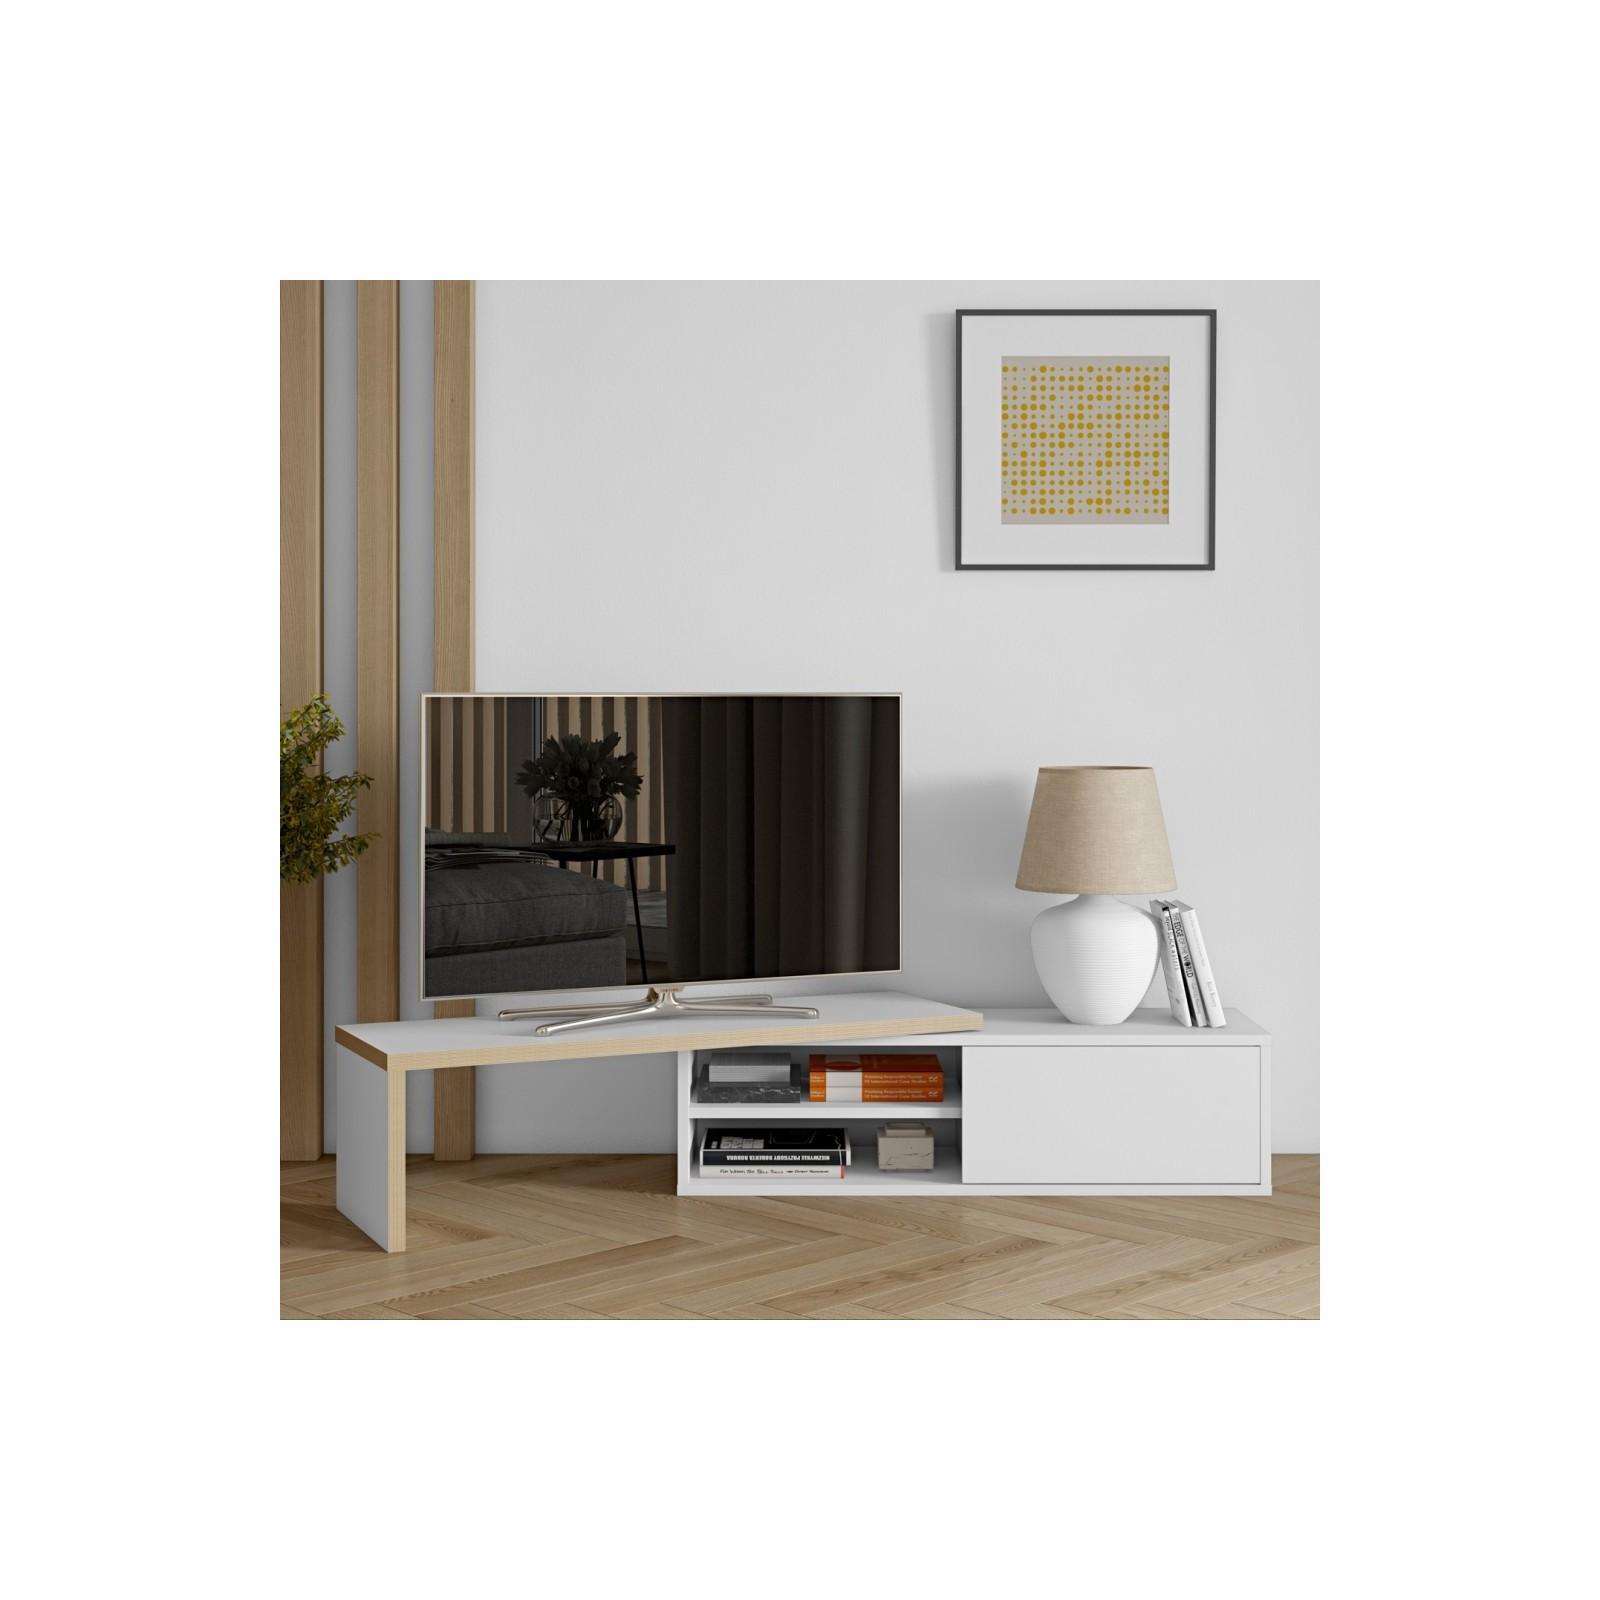 Meuble TV Modulaire contreplaqué & blanc - Arne Concept